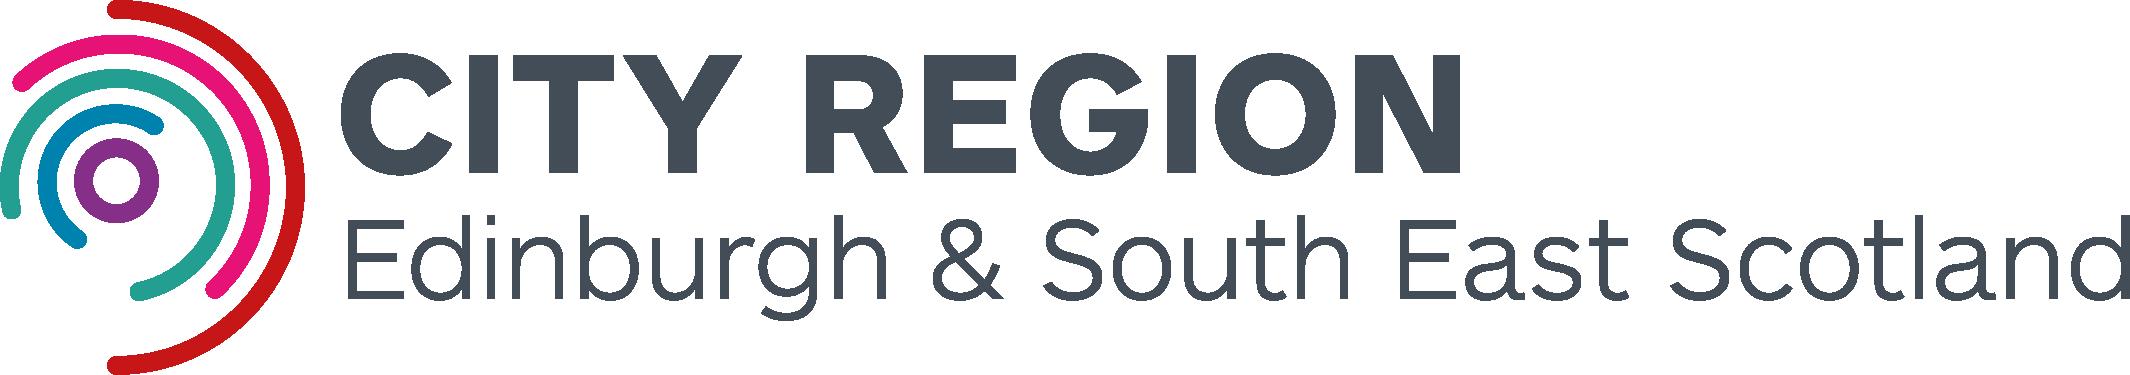 City Region Edinburgh and South East Scotland